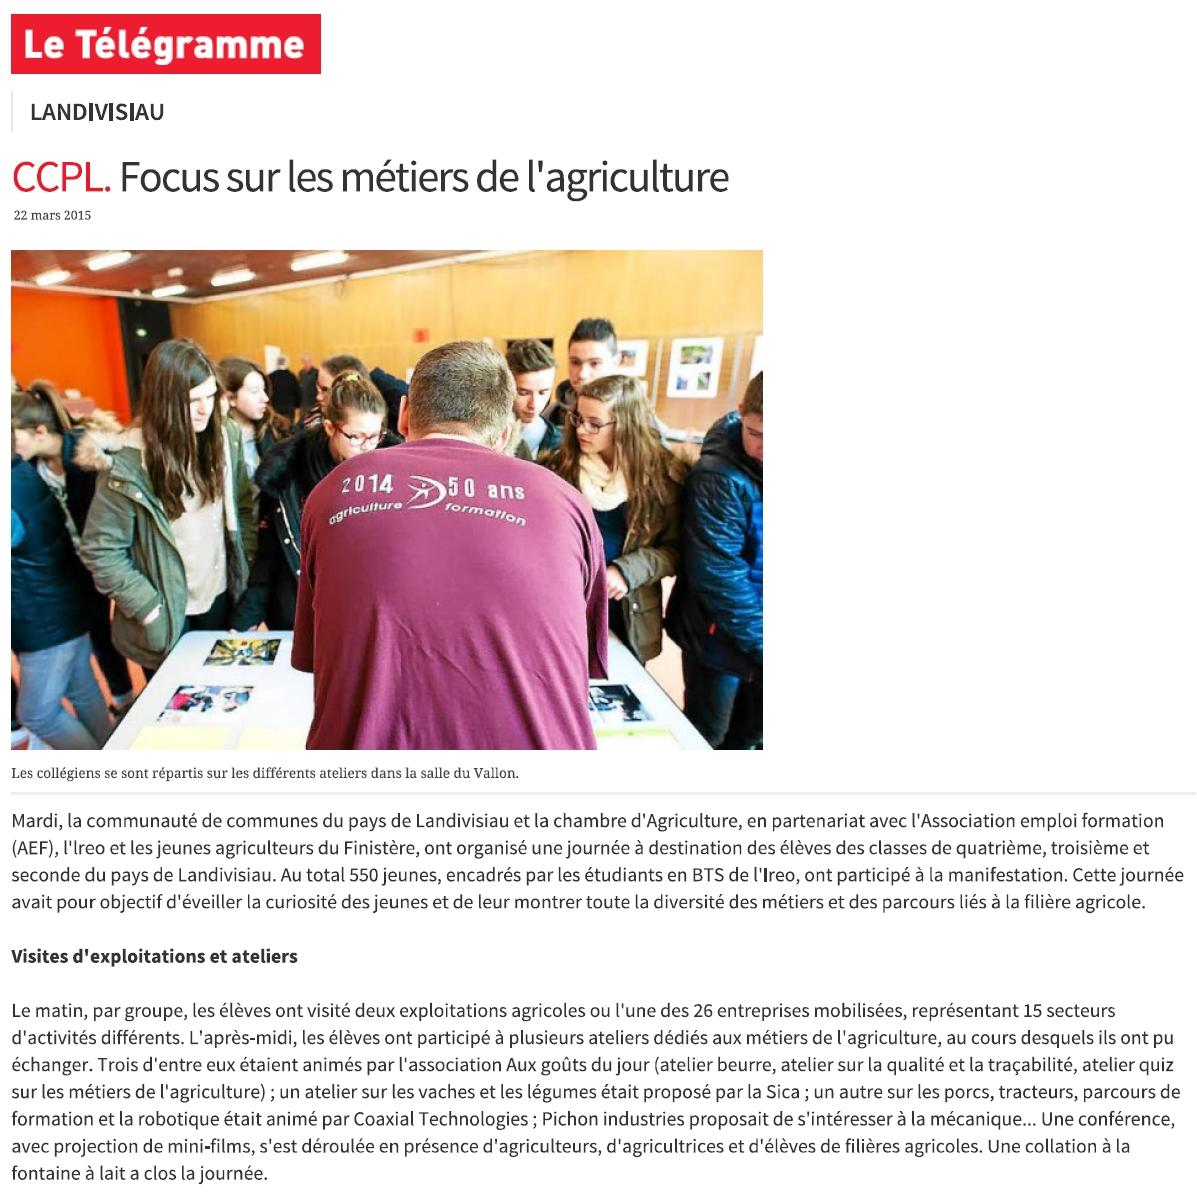 Le_Telegramme_22.03.15